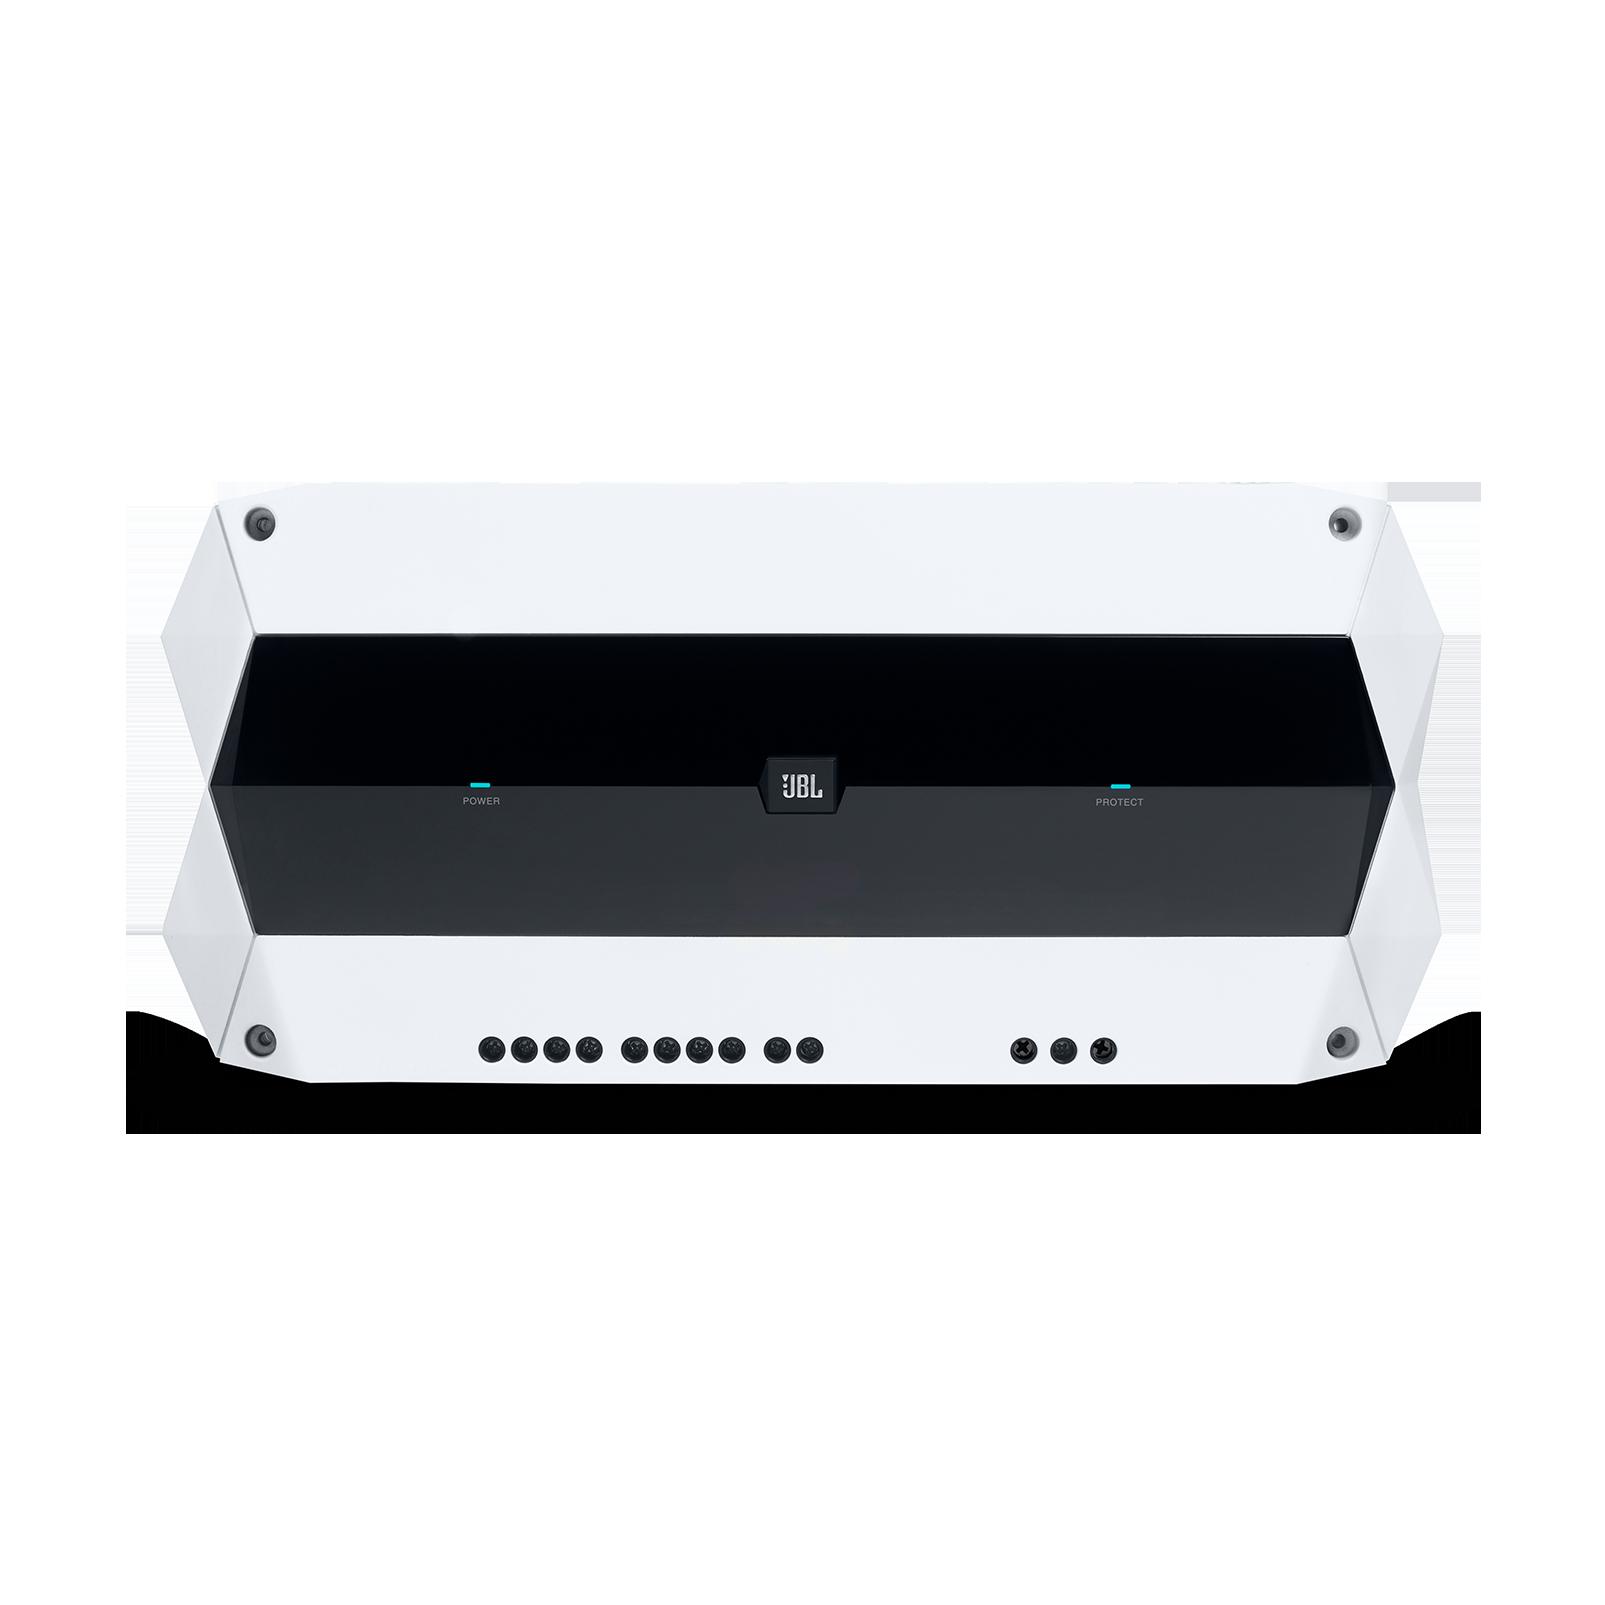 JBL Marine MA4505 - White Matte - Multi-element high-performance, 5-channel amplifier - Detailshot 4